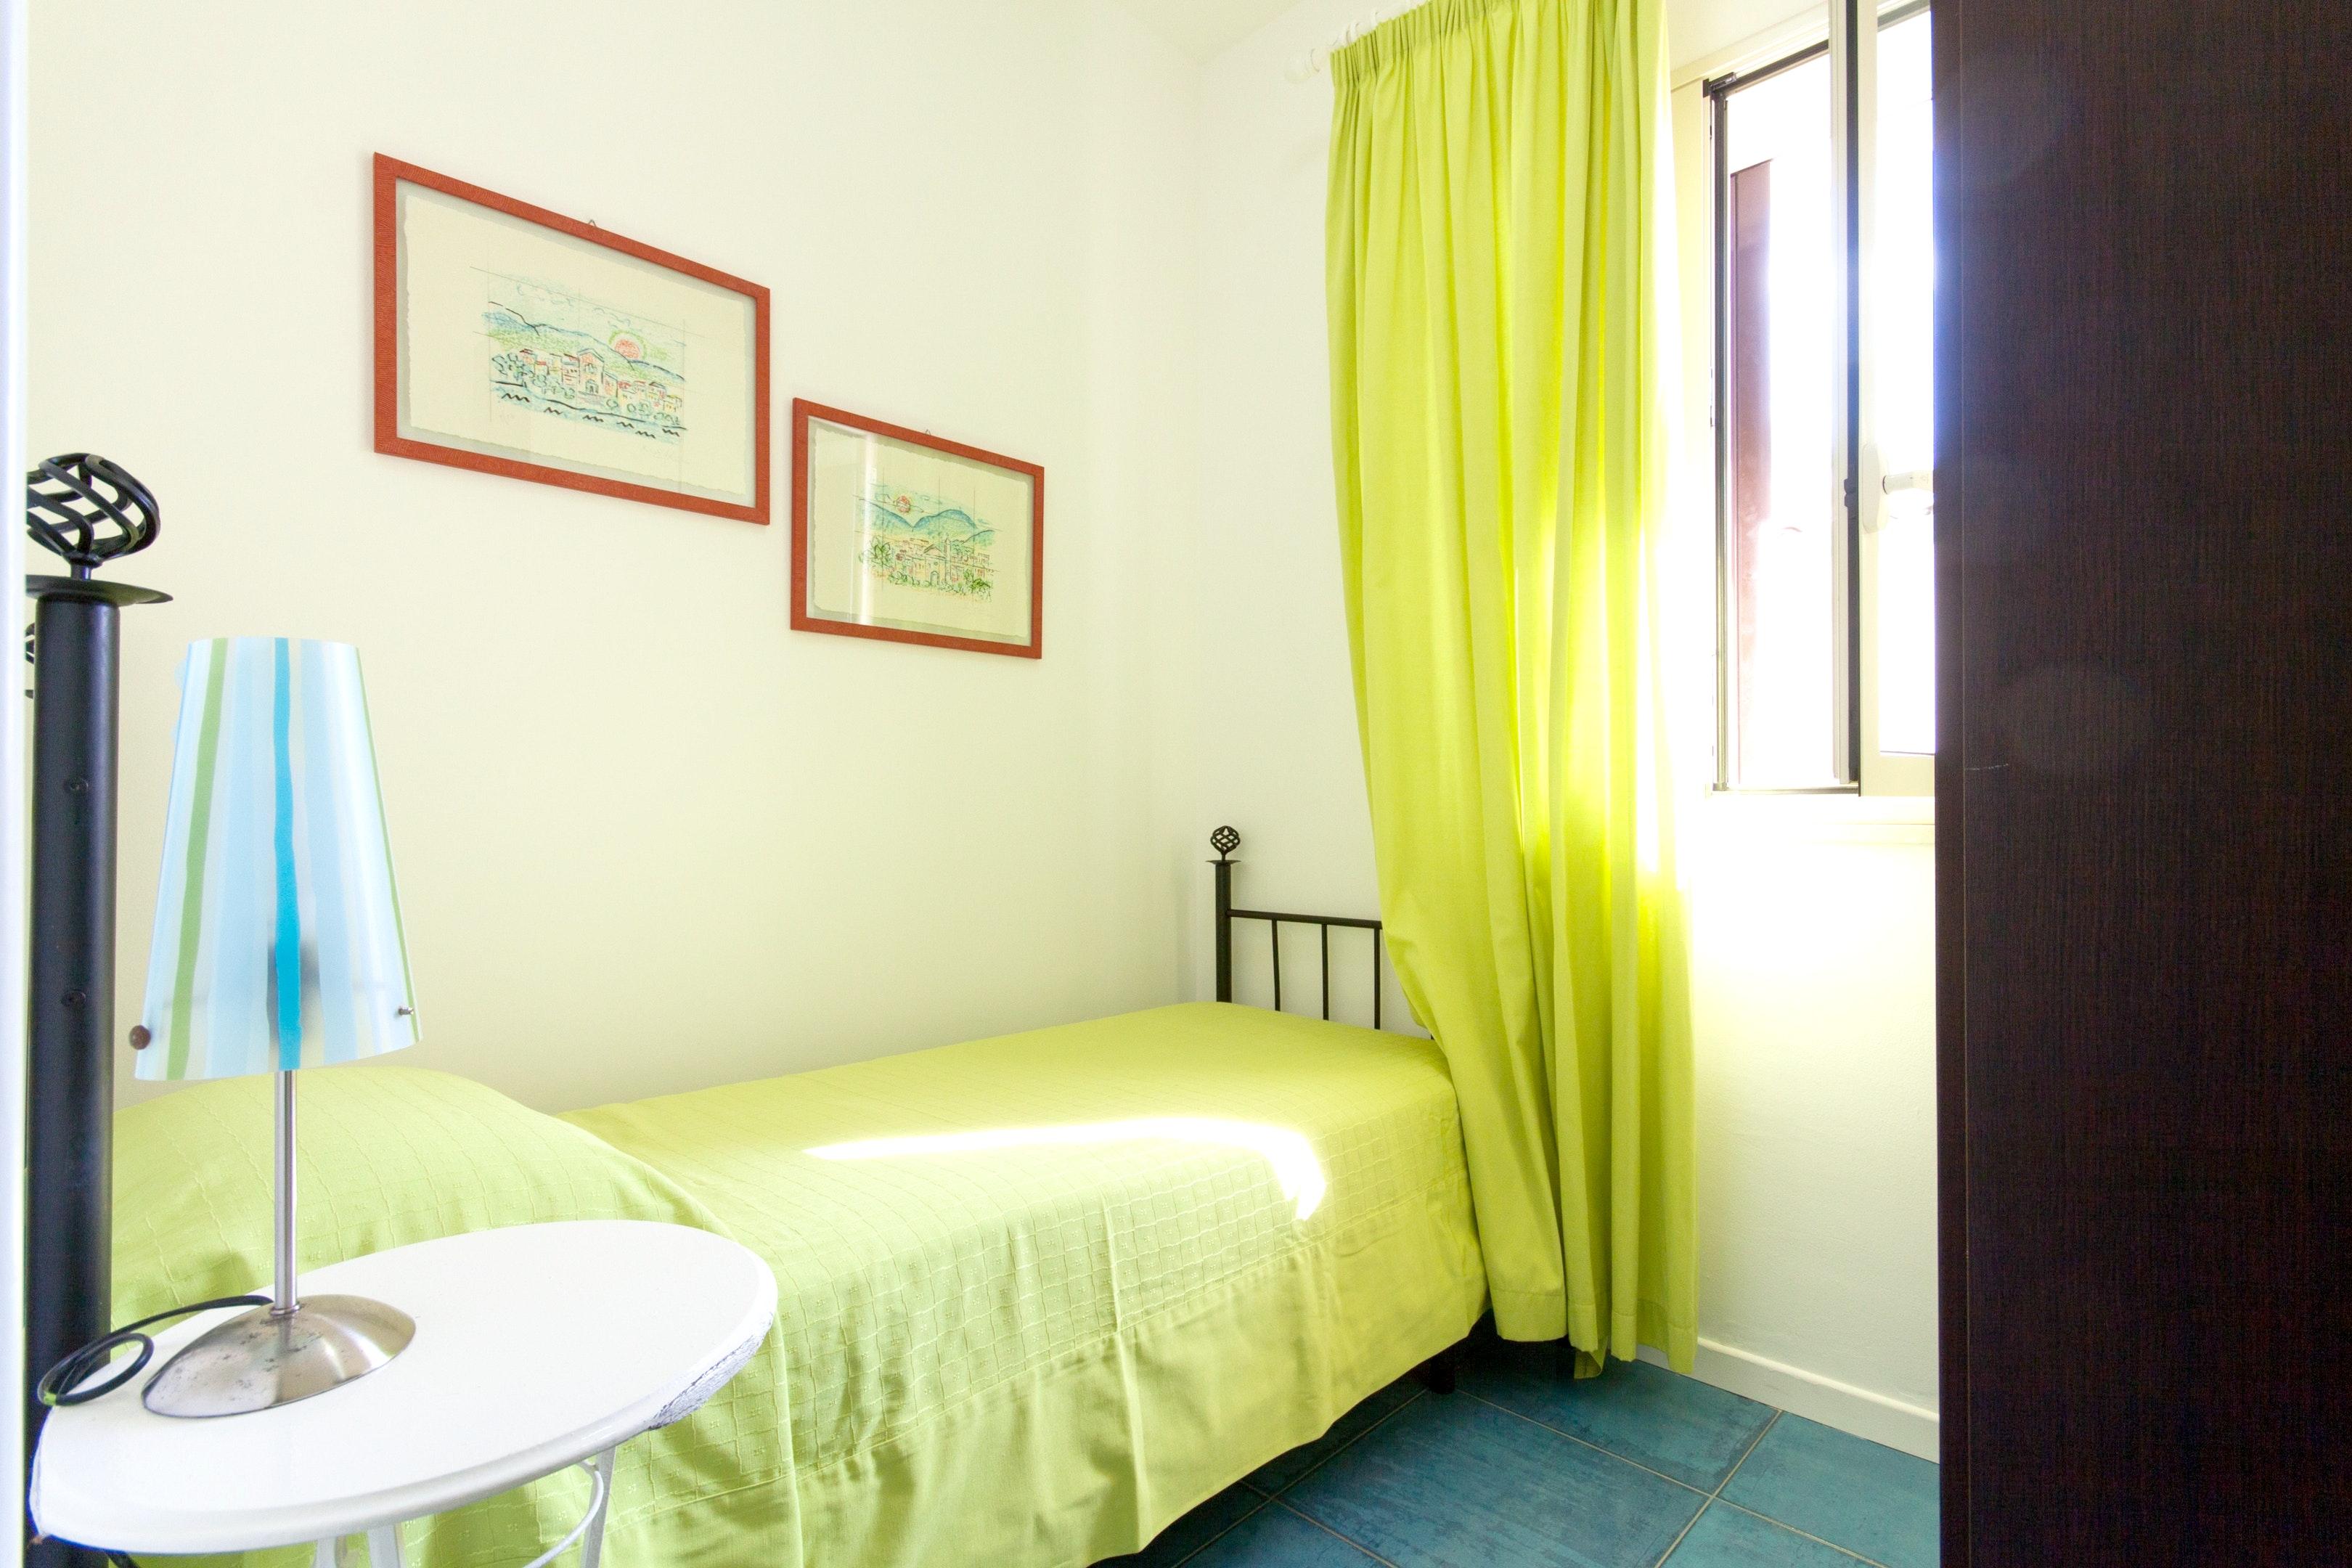 Holiday apartment Wohnung mit 4 Schlafzimmern in Piano di Trappeto mit herrlichem Meerblick, möblierter Terr (2236750), Balestrate, Palermo, Sicily, Italy, picture 15